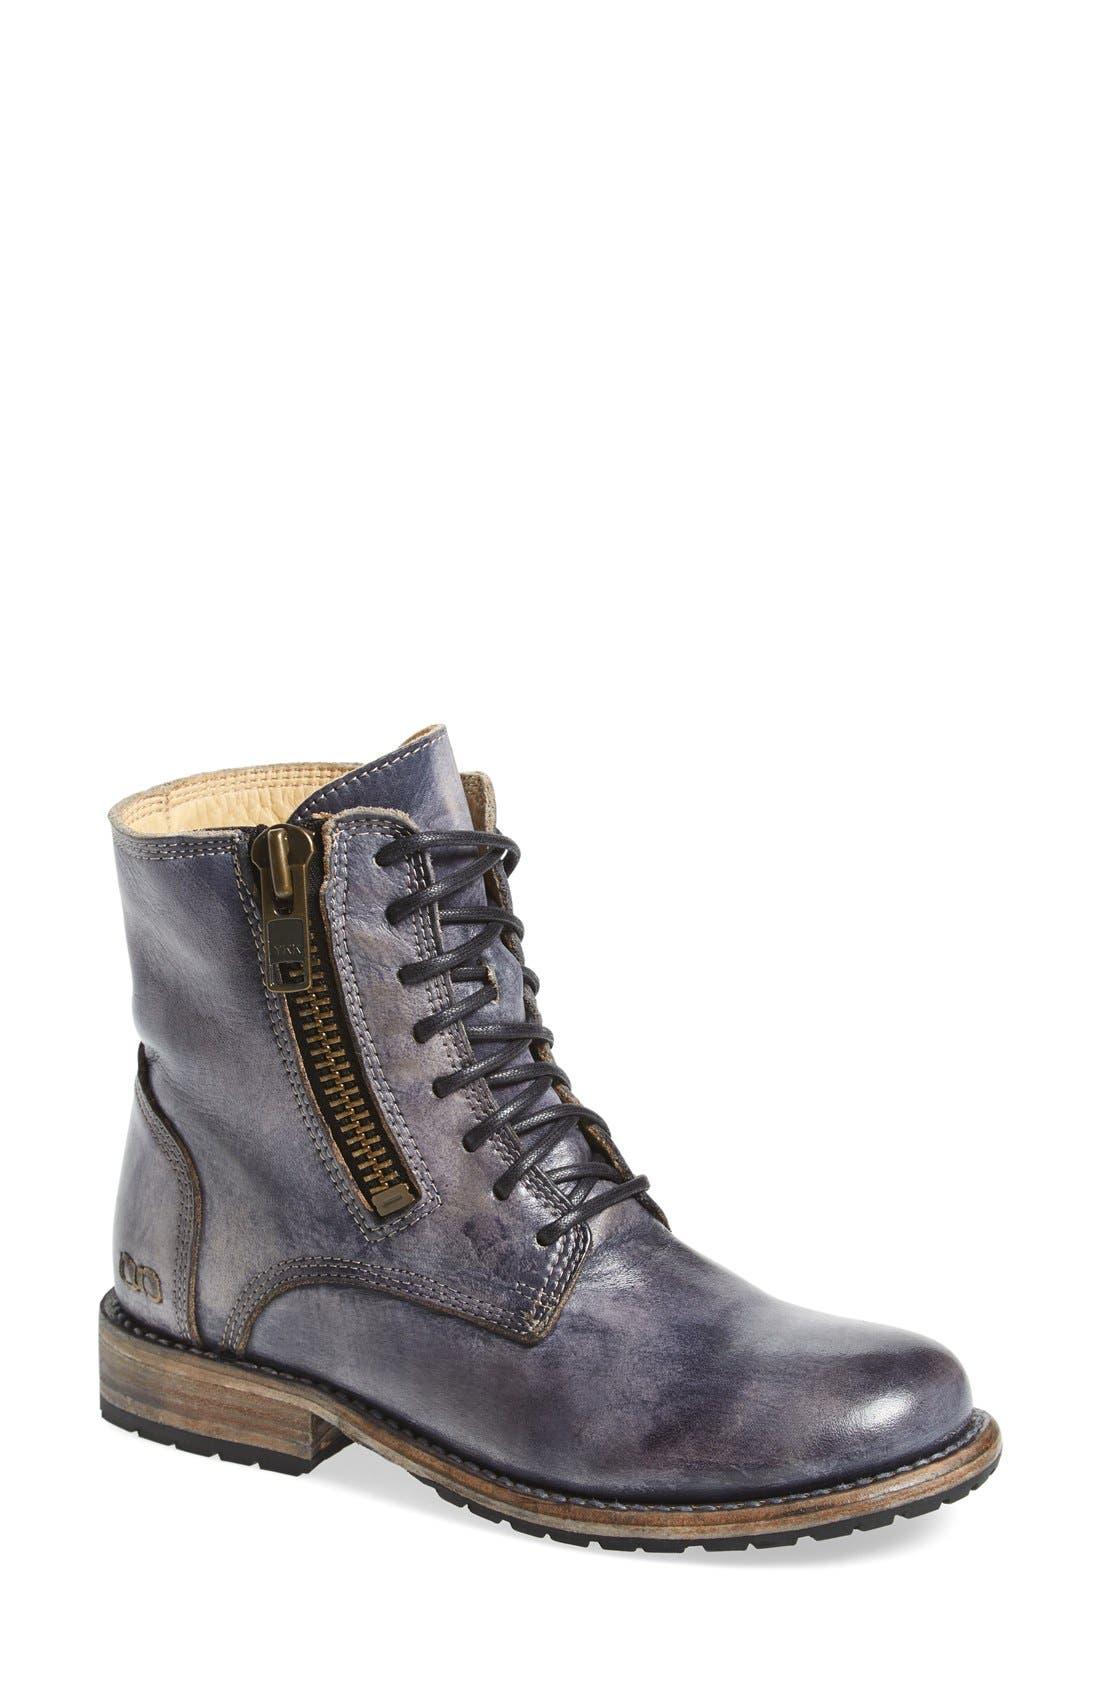 BED STU 'Tactic' Boot, Main, color, 001